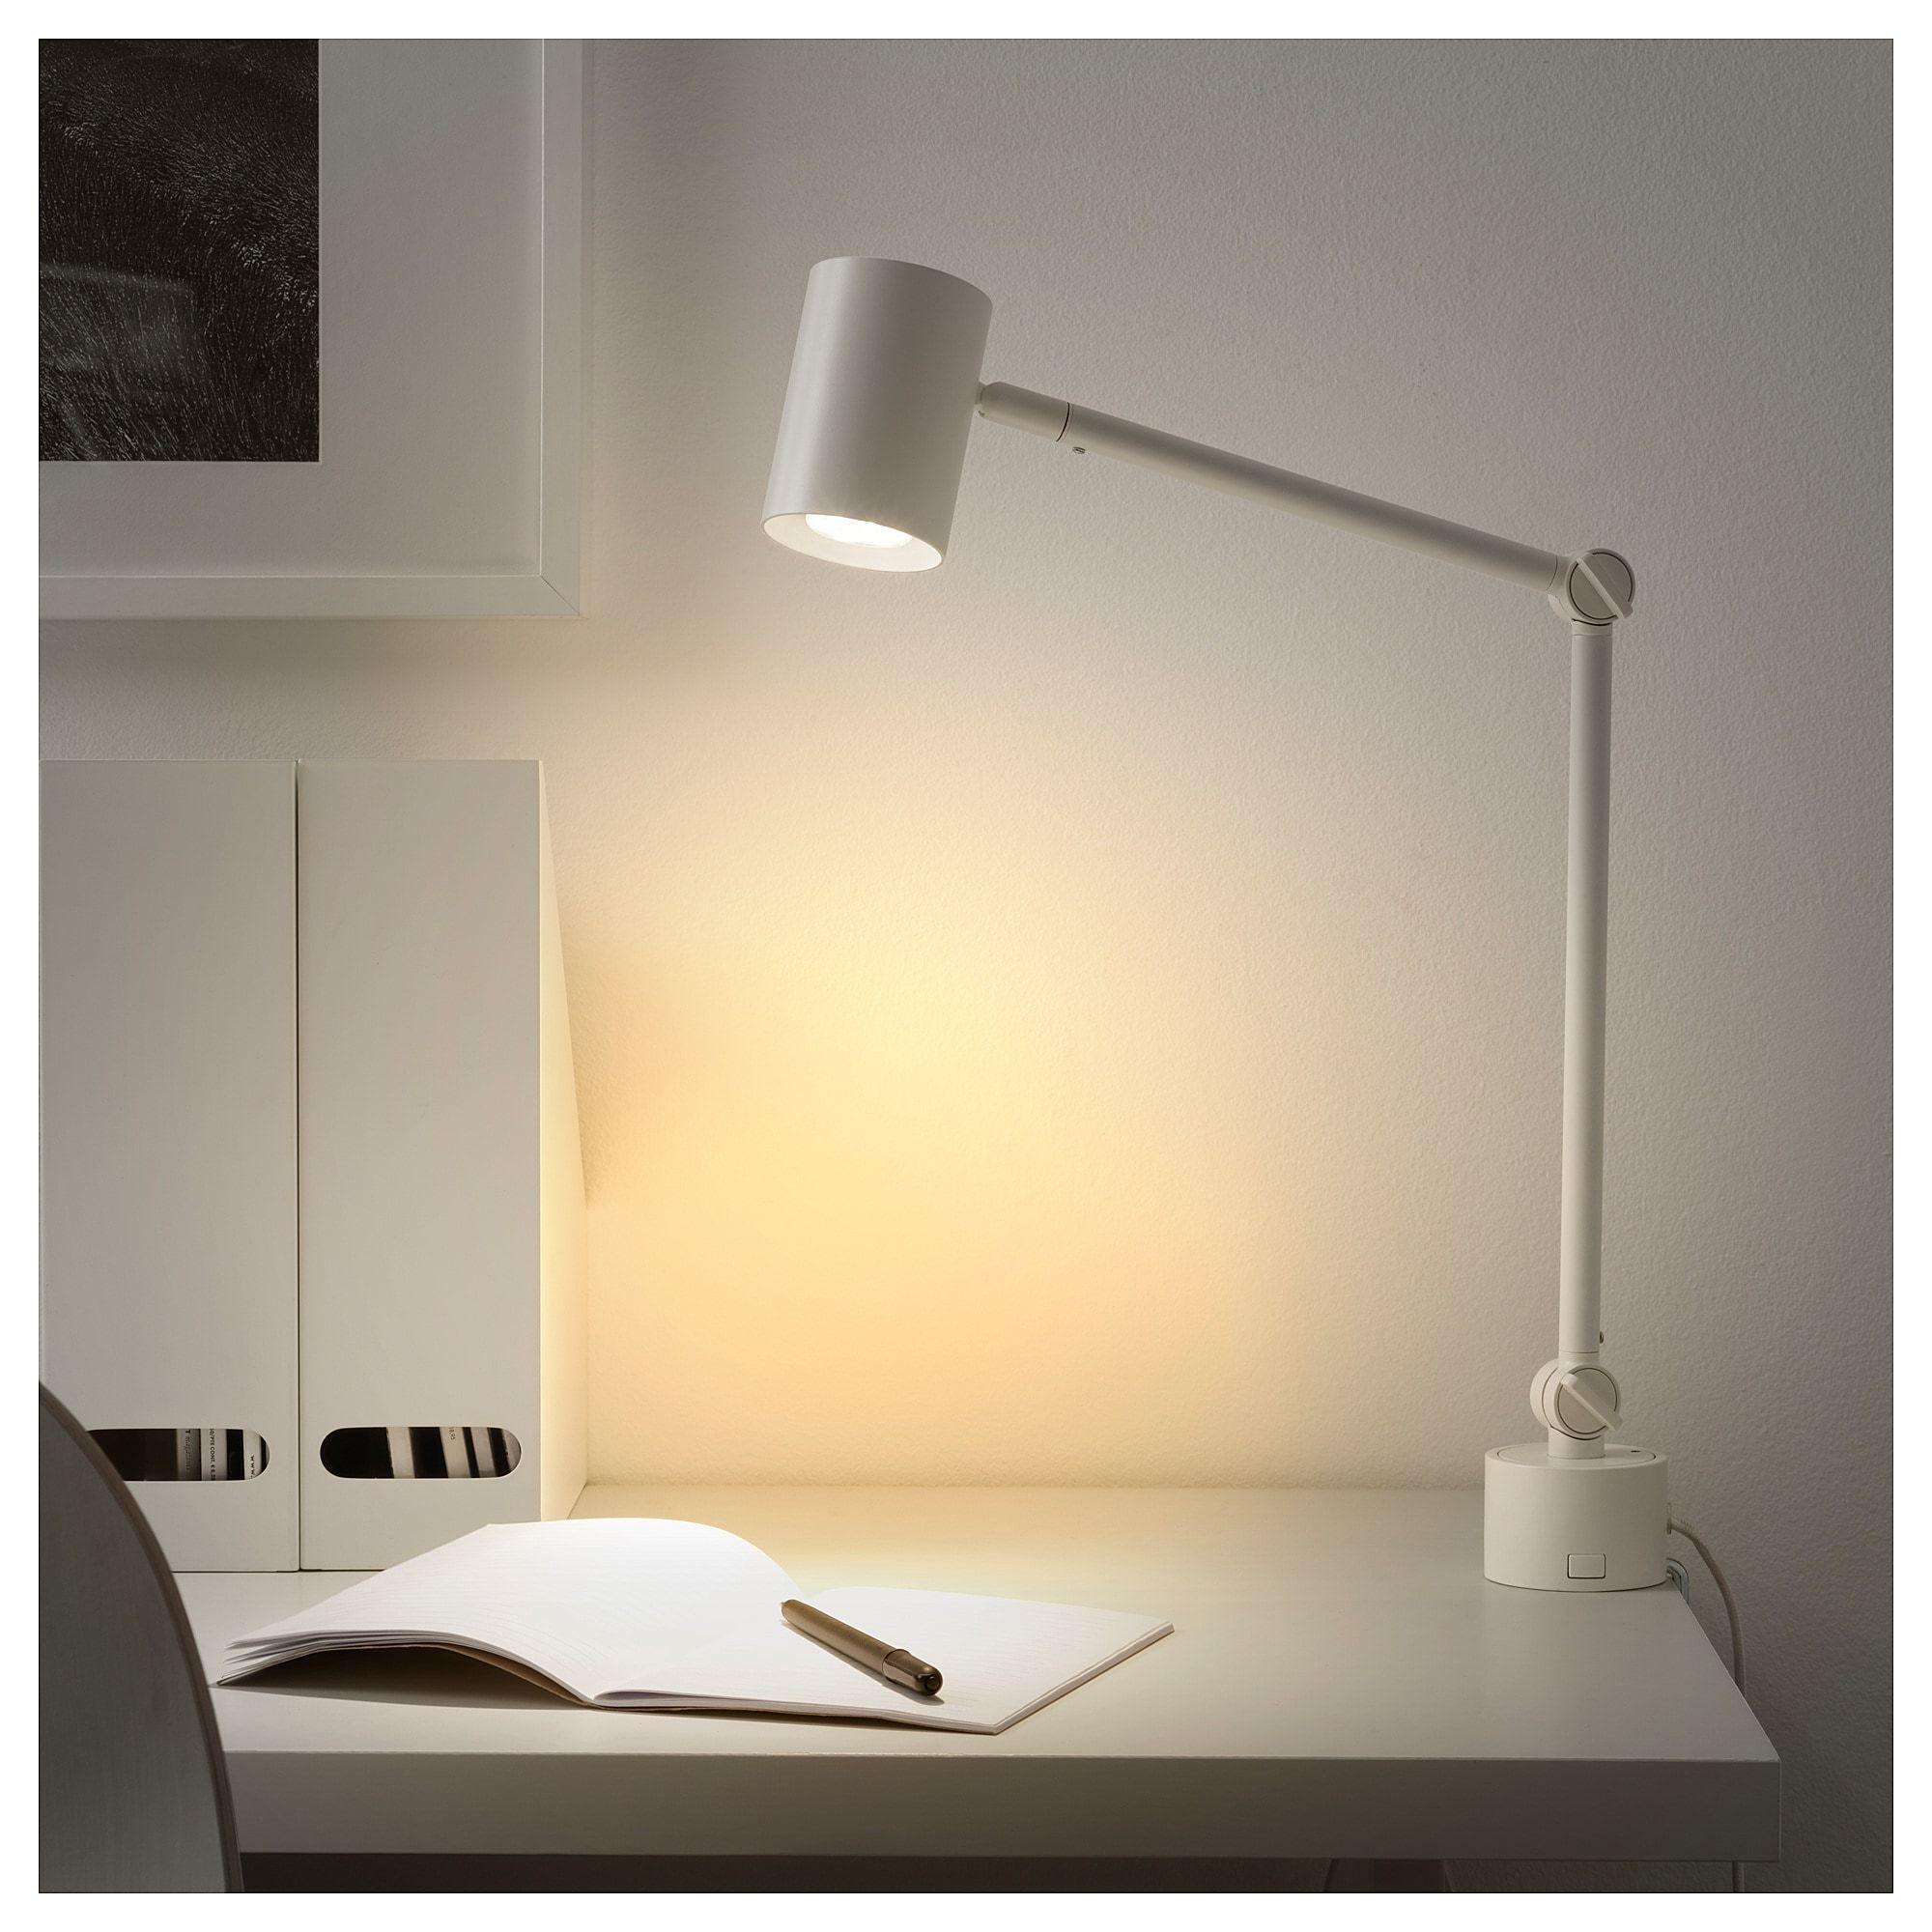 Nymane Bureau Wandlamp Wit Ikea Wall Lamp Lamp Ikea